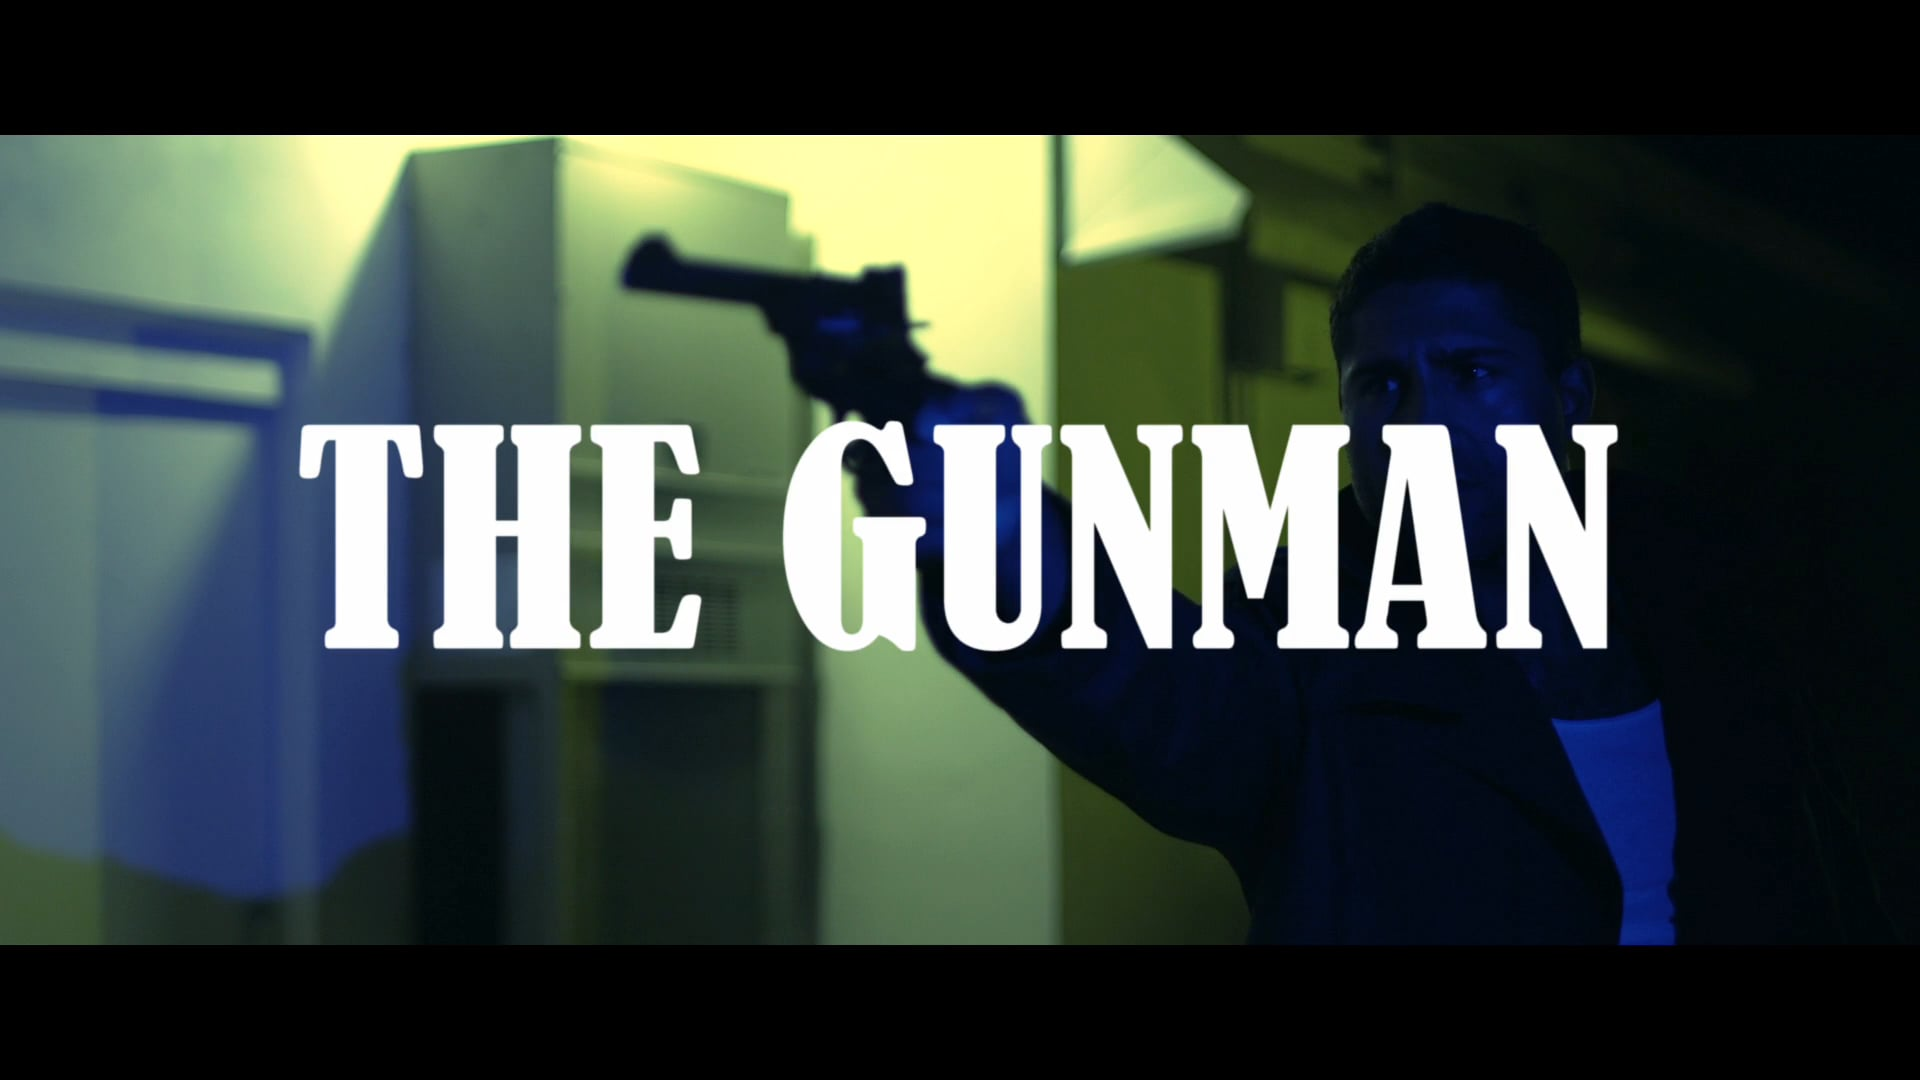 THE GUNMAN - Teaser Trailer